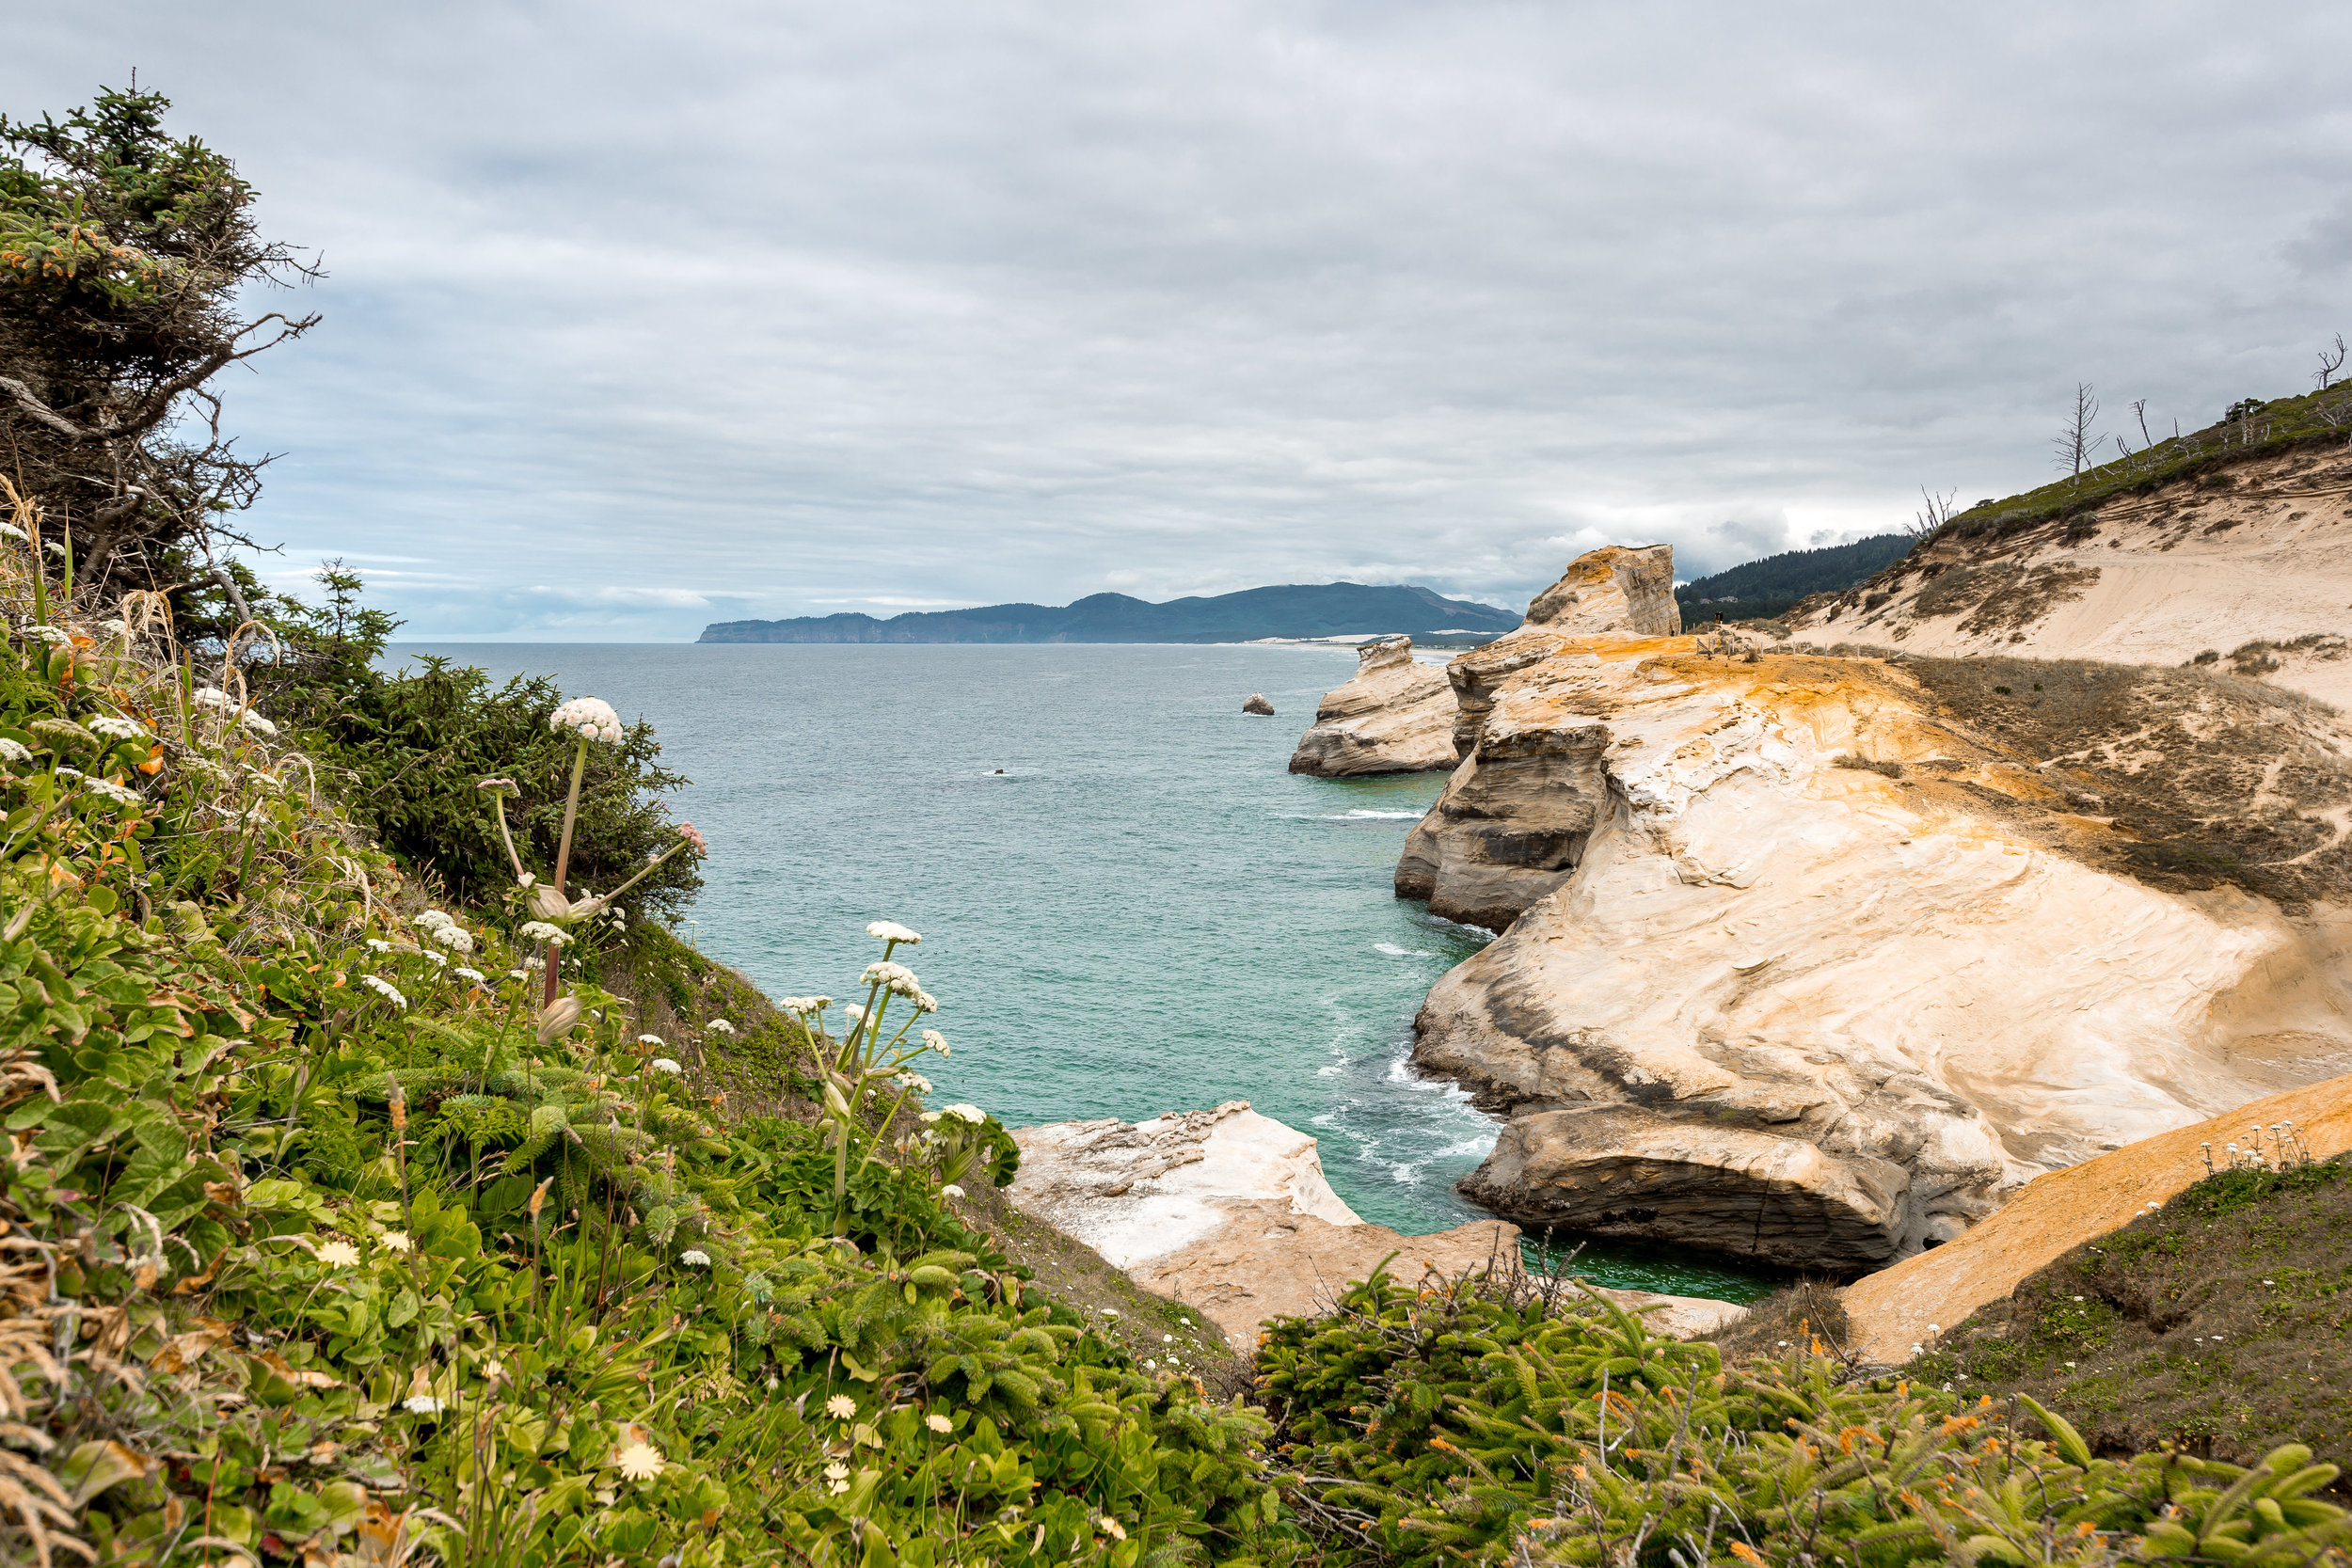 nicole-daacke-photography-oregon-coast-landscapes-elopement-photographer-wedding-photography-adventure-lifestyle-roadtrip-along-oregon-coast-cape-kiwanda-oceanside-beach-cannon-beach-oregon-pnw-4.jpg